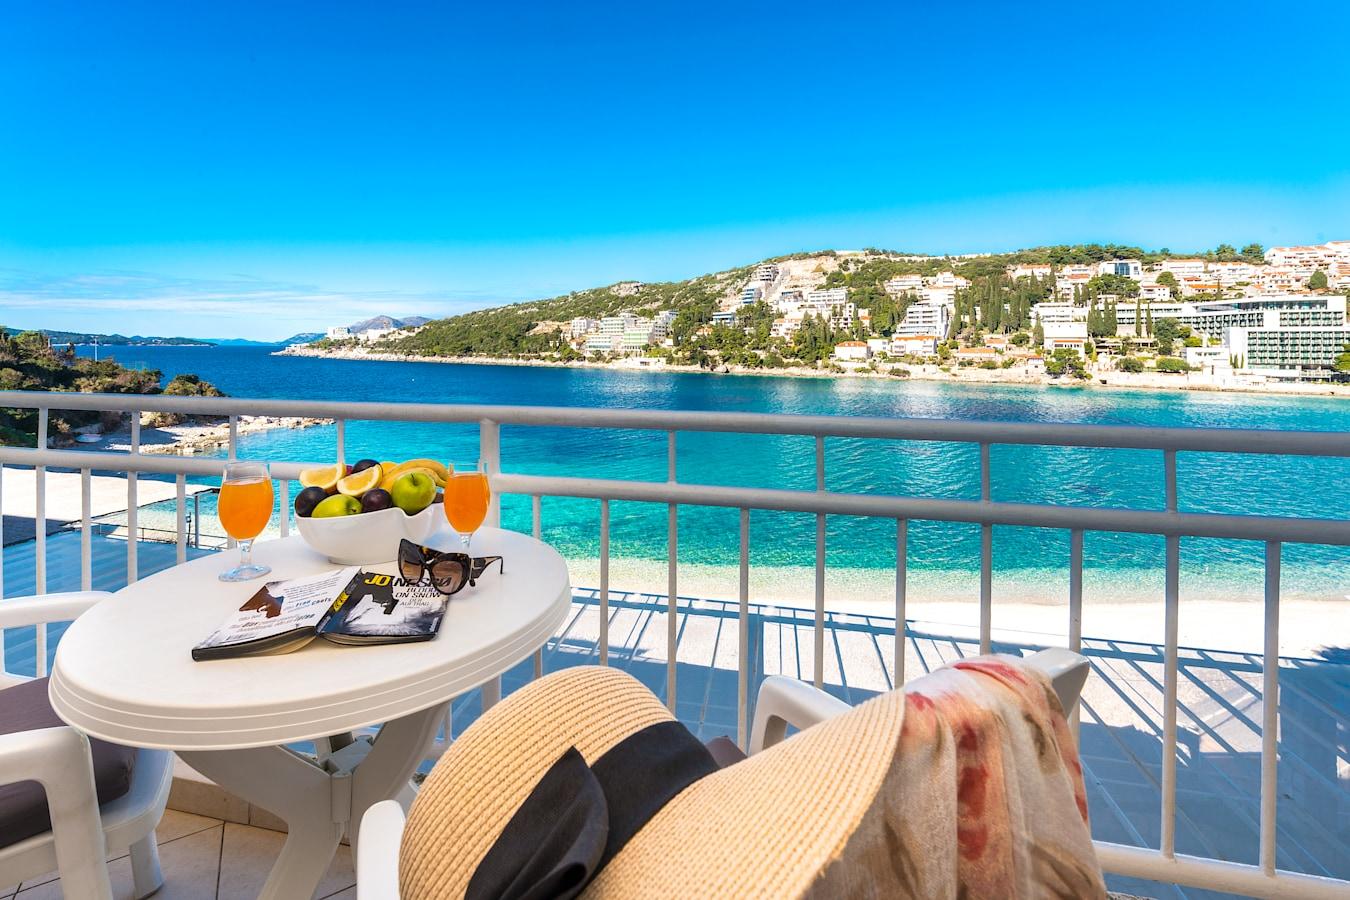 vis-hotel-dubrovnik-room-seaview-balcony.jpg